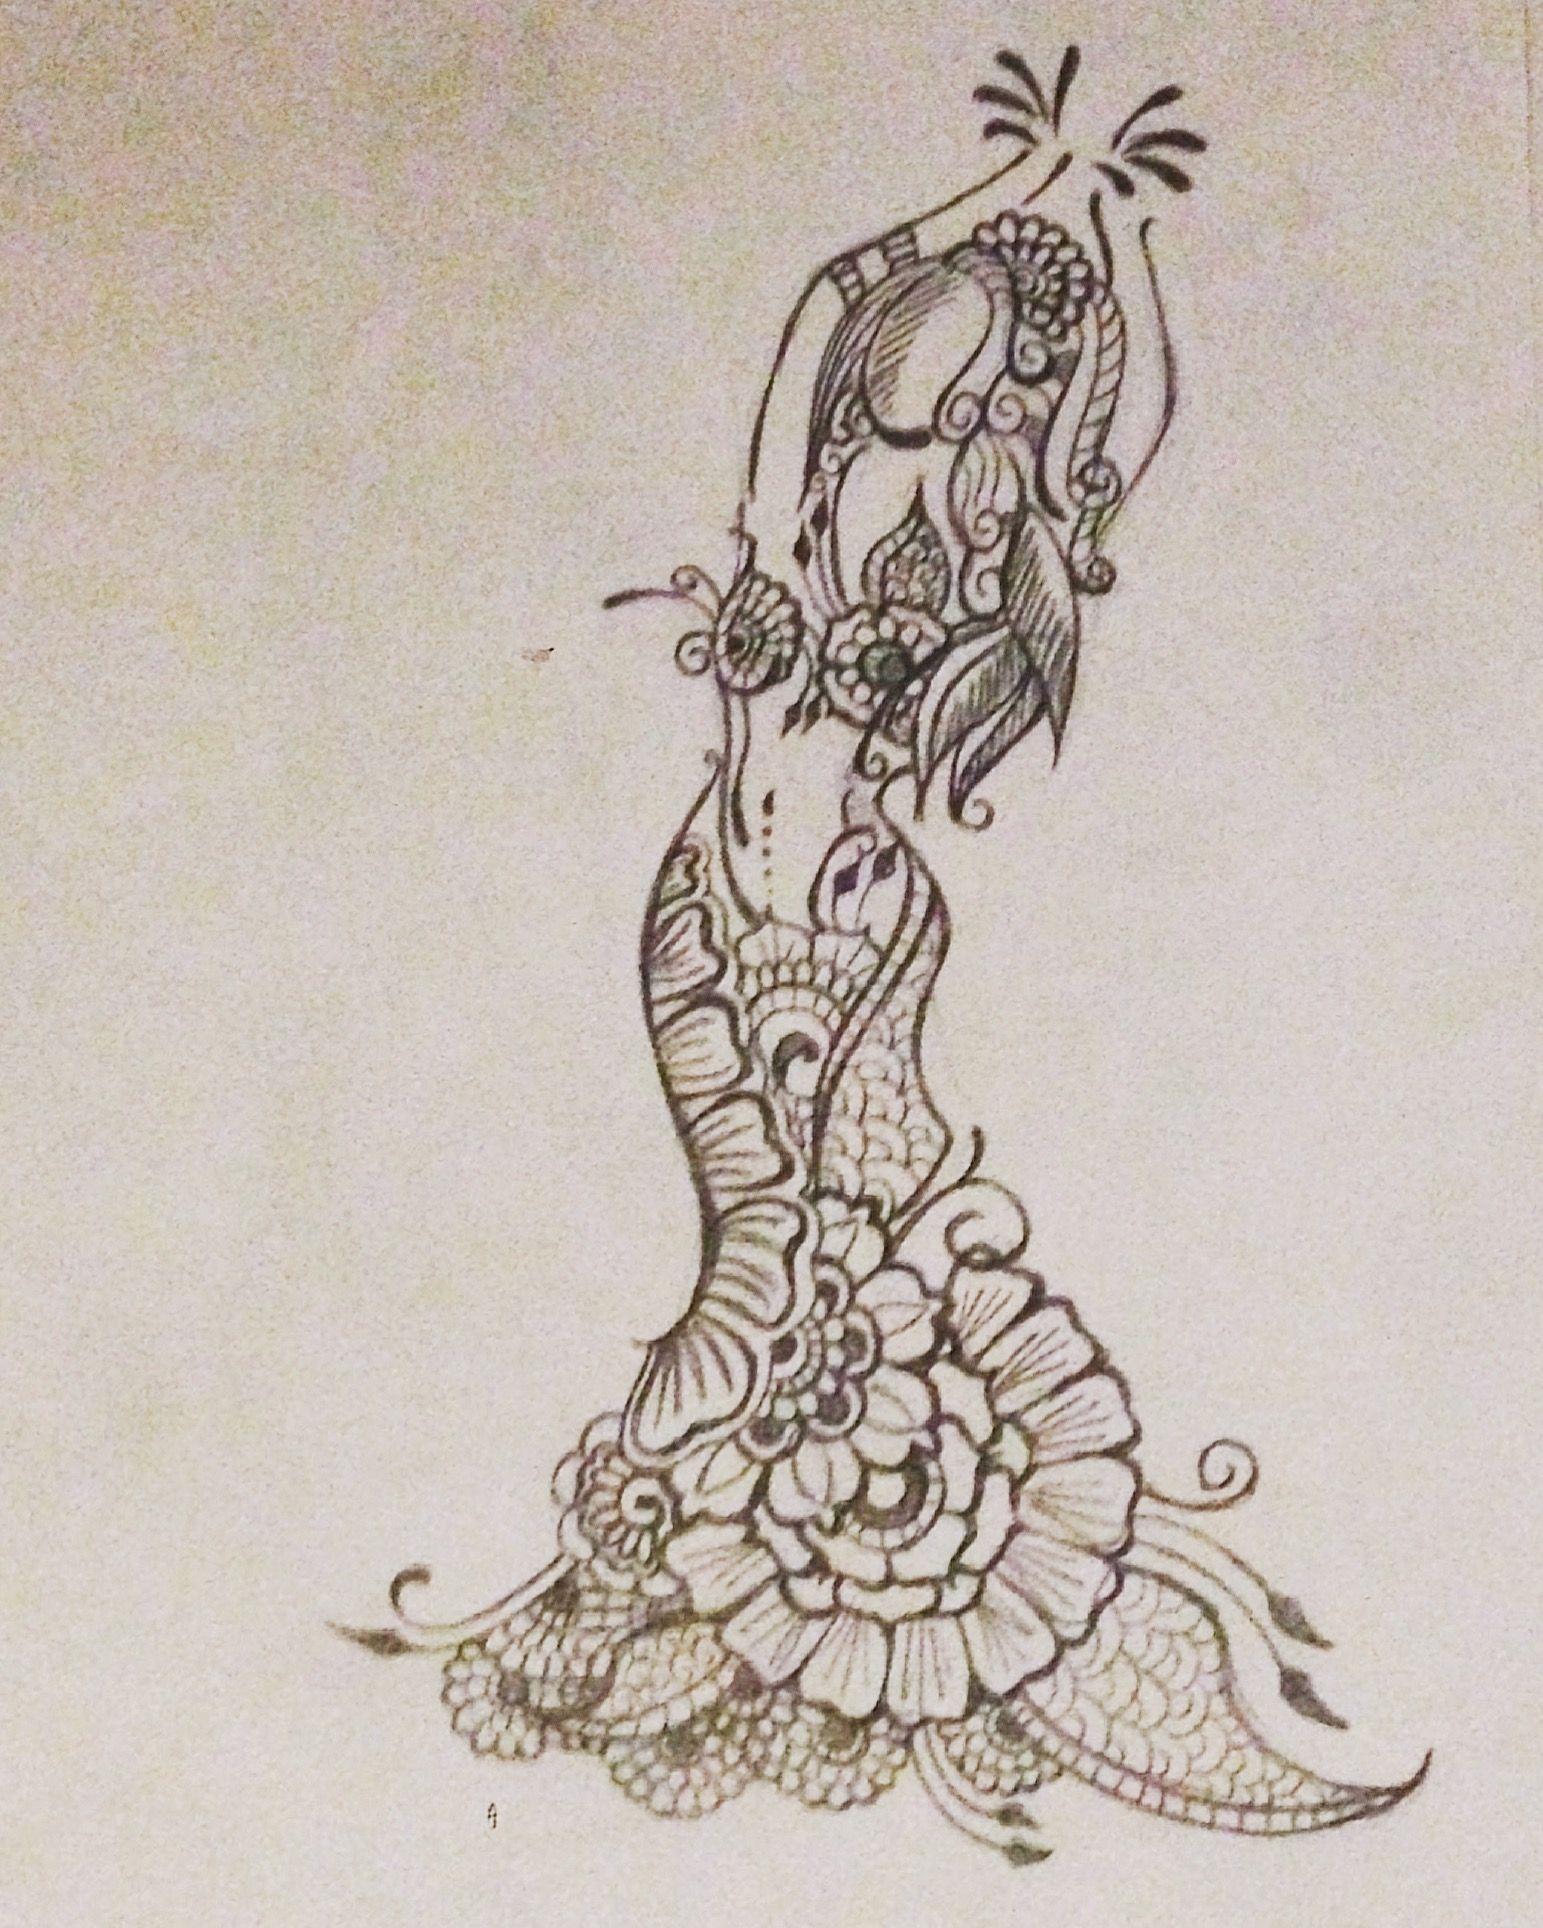 Pin By Lia Marquesi On Pinlerim Dancer Tattoo Belly Dance Dance Tattoo